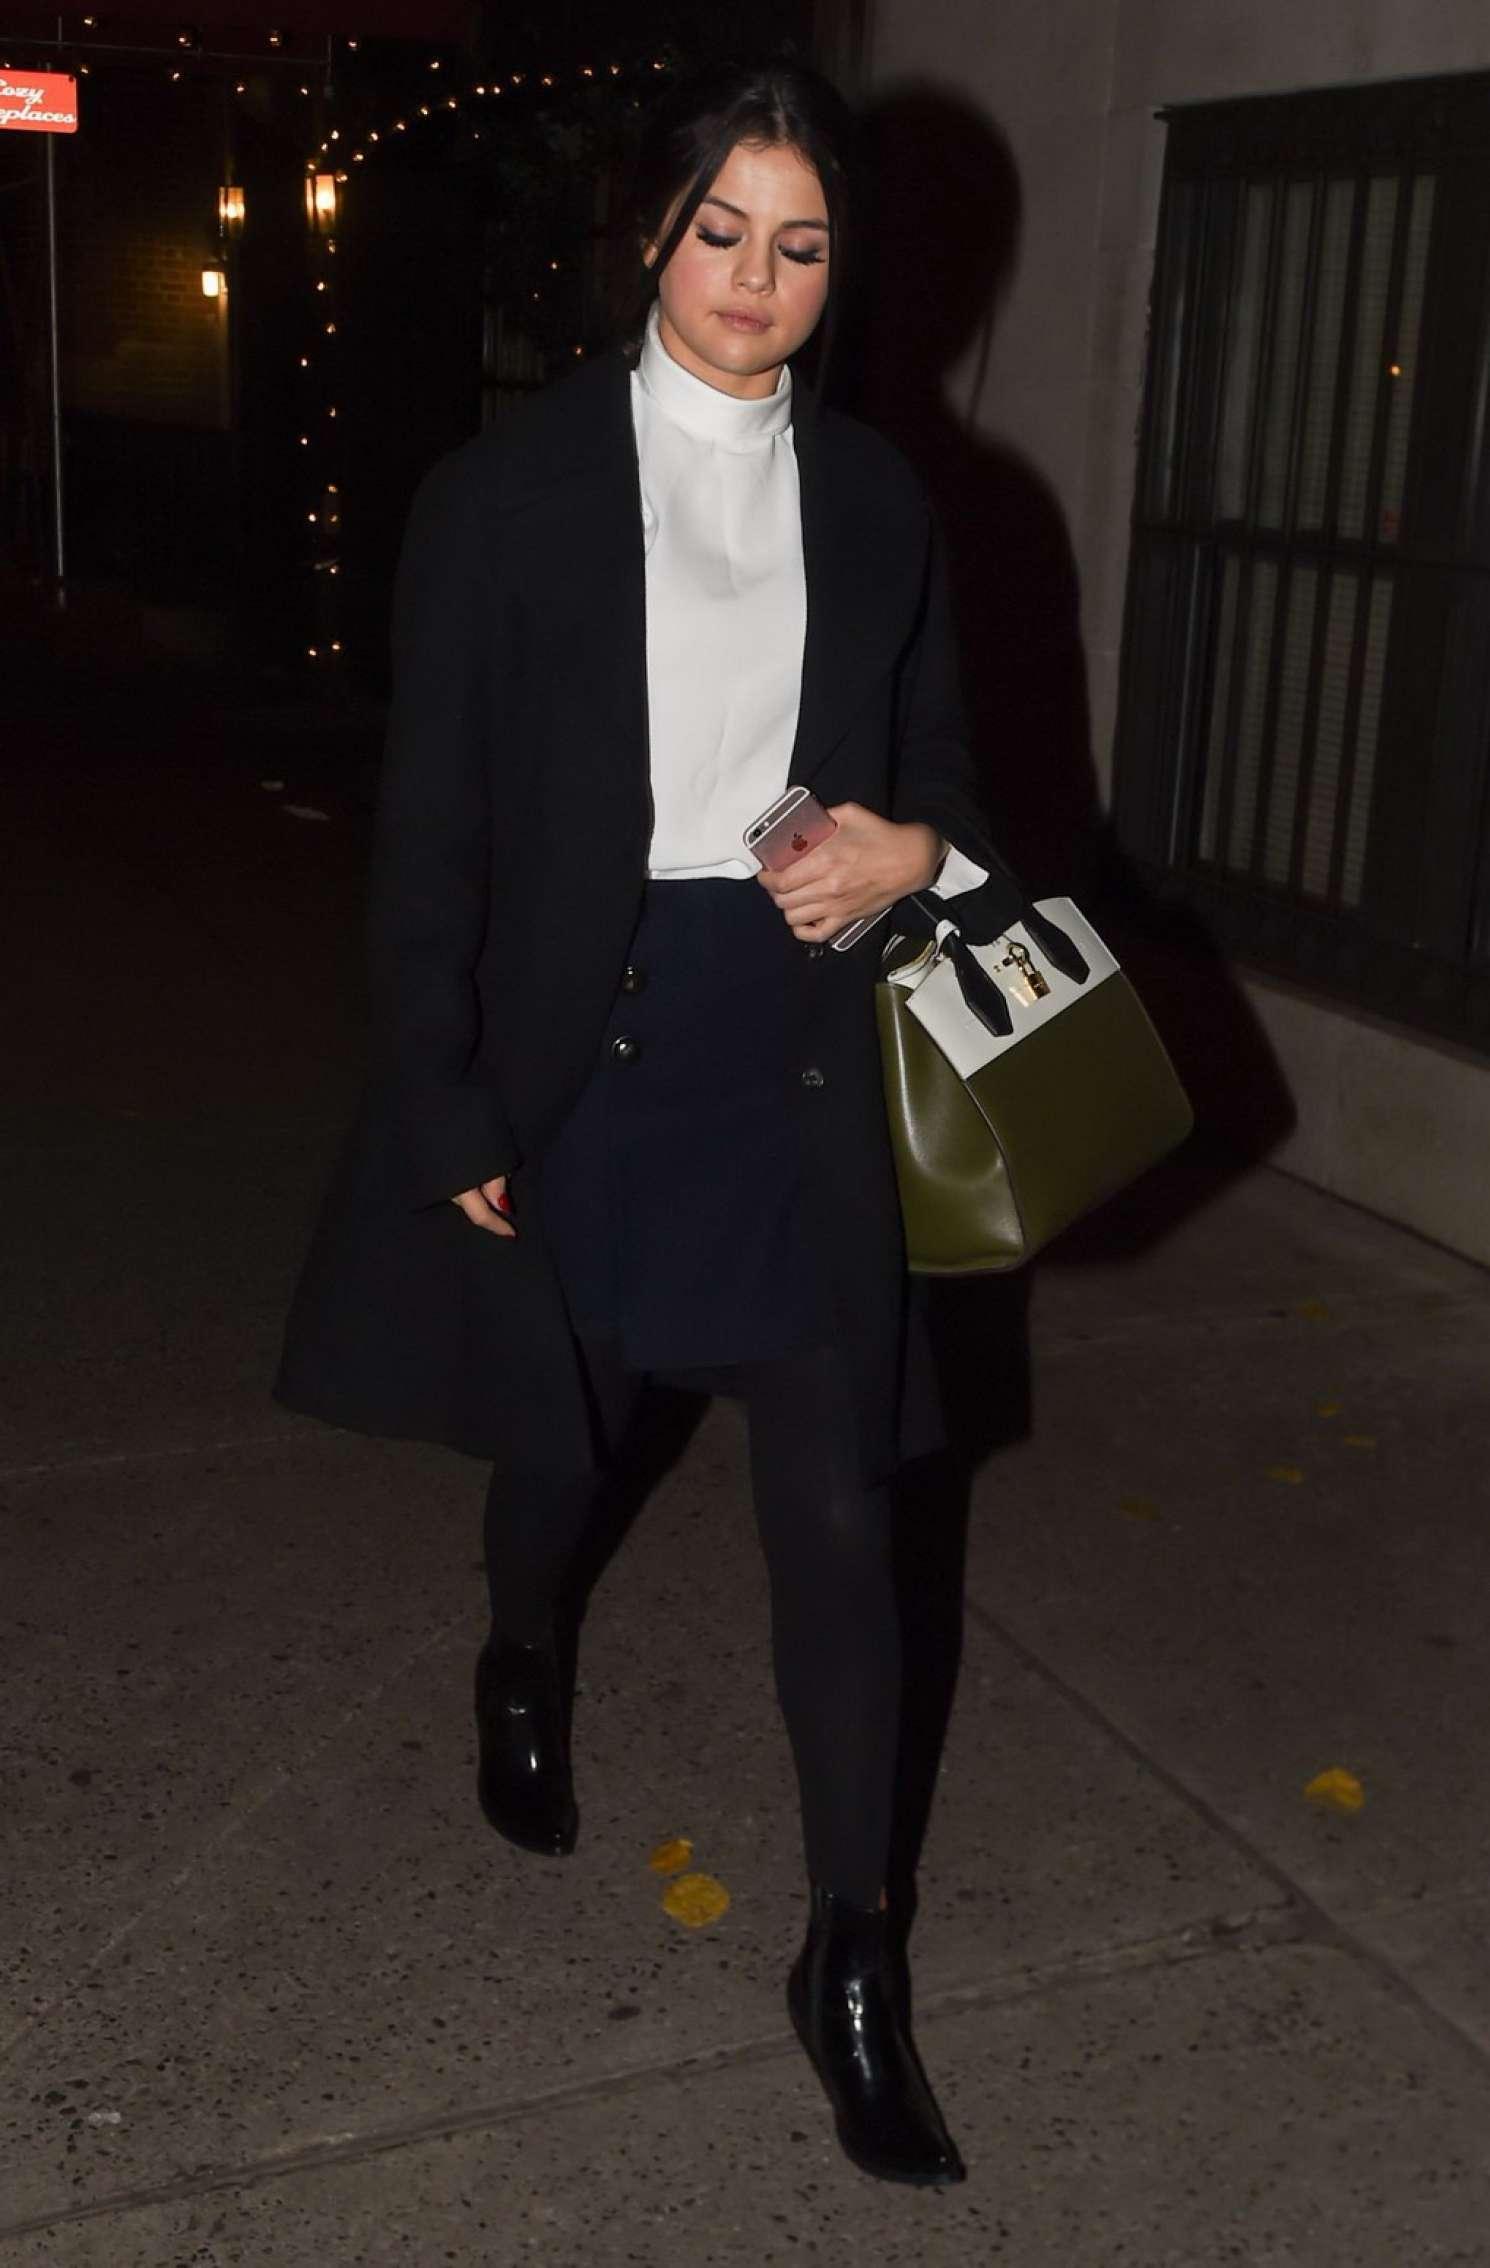 Selena Gomez - Leaving 'Joanne Trattoria' Restaurant in NYC